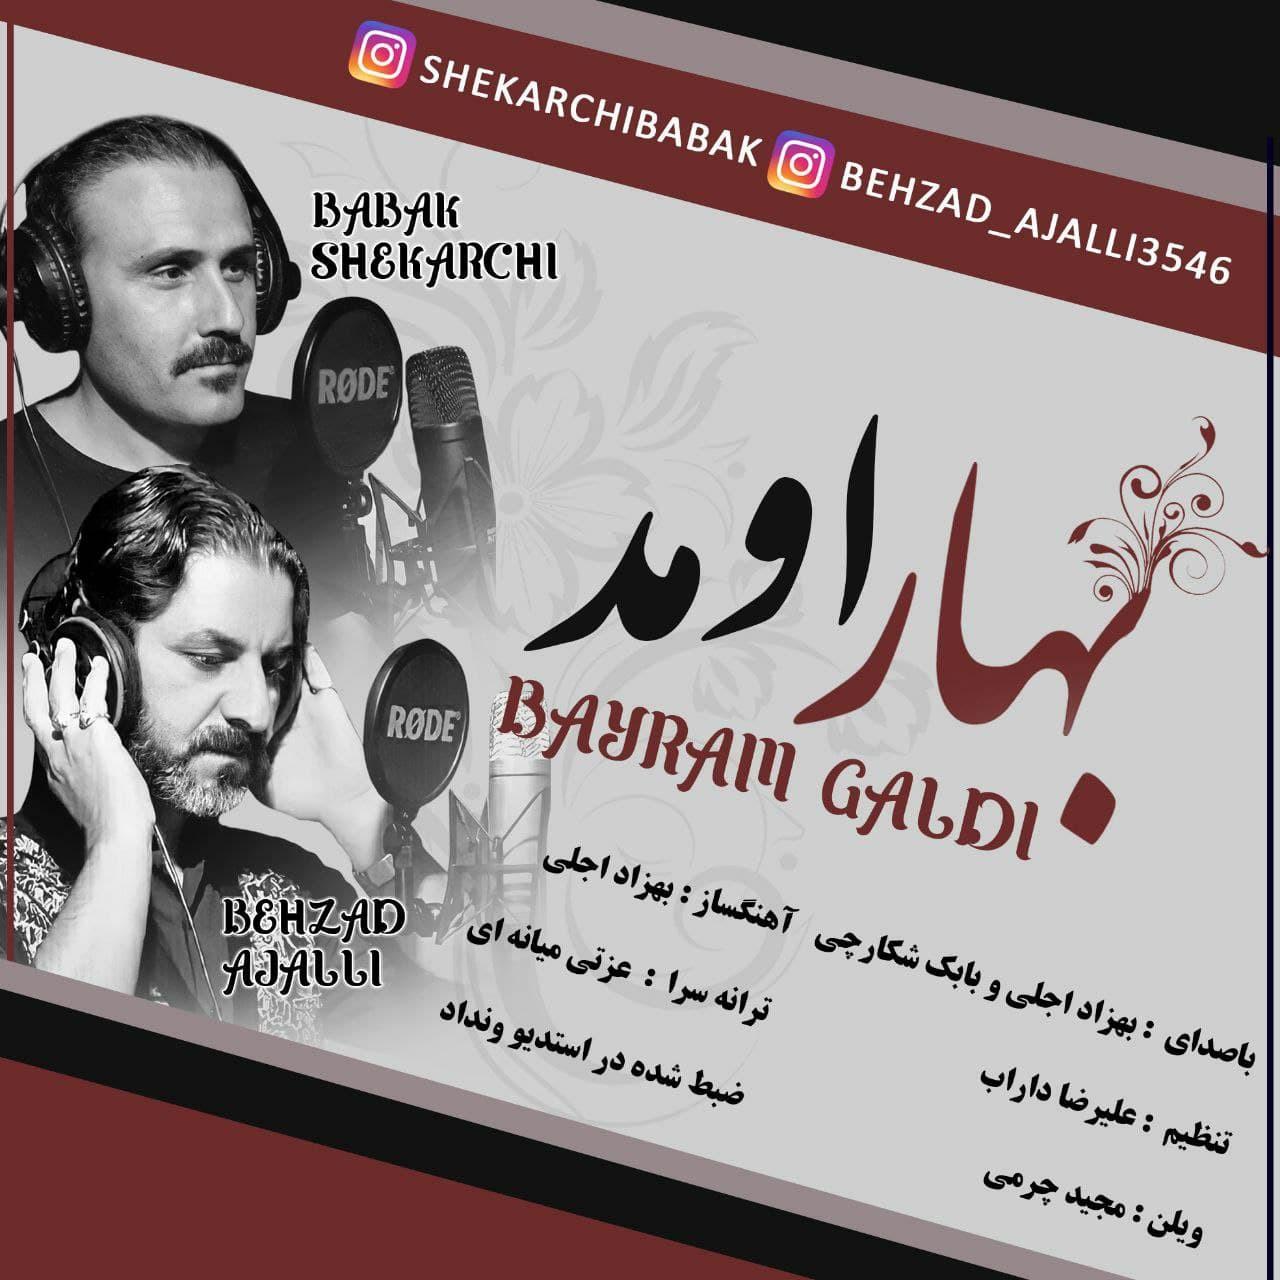 https://s19.picofile.com/file/8438828026/07Behzad_Ajalli_Ft_Babak_Shekarchii_Bayram_Galdi.jpg